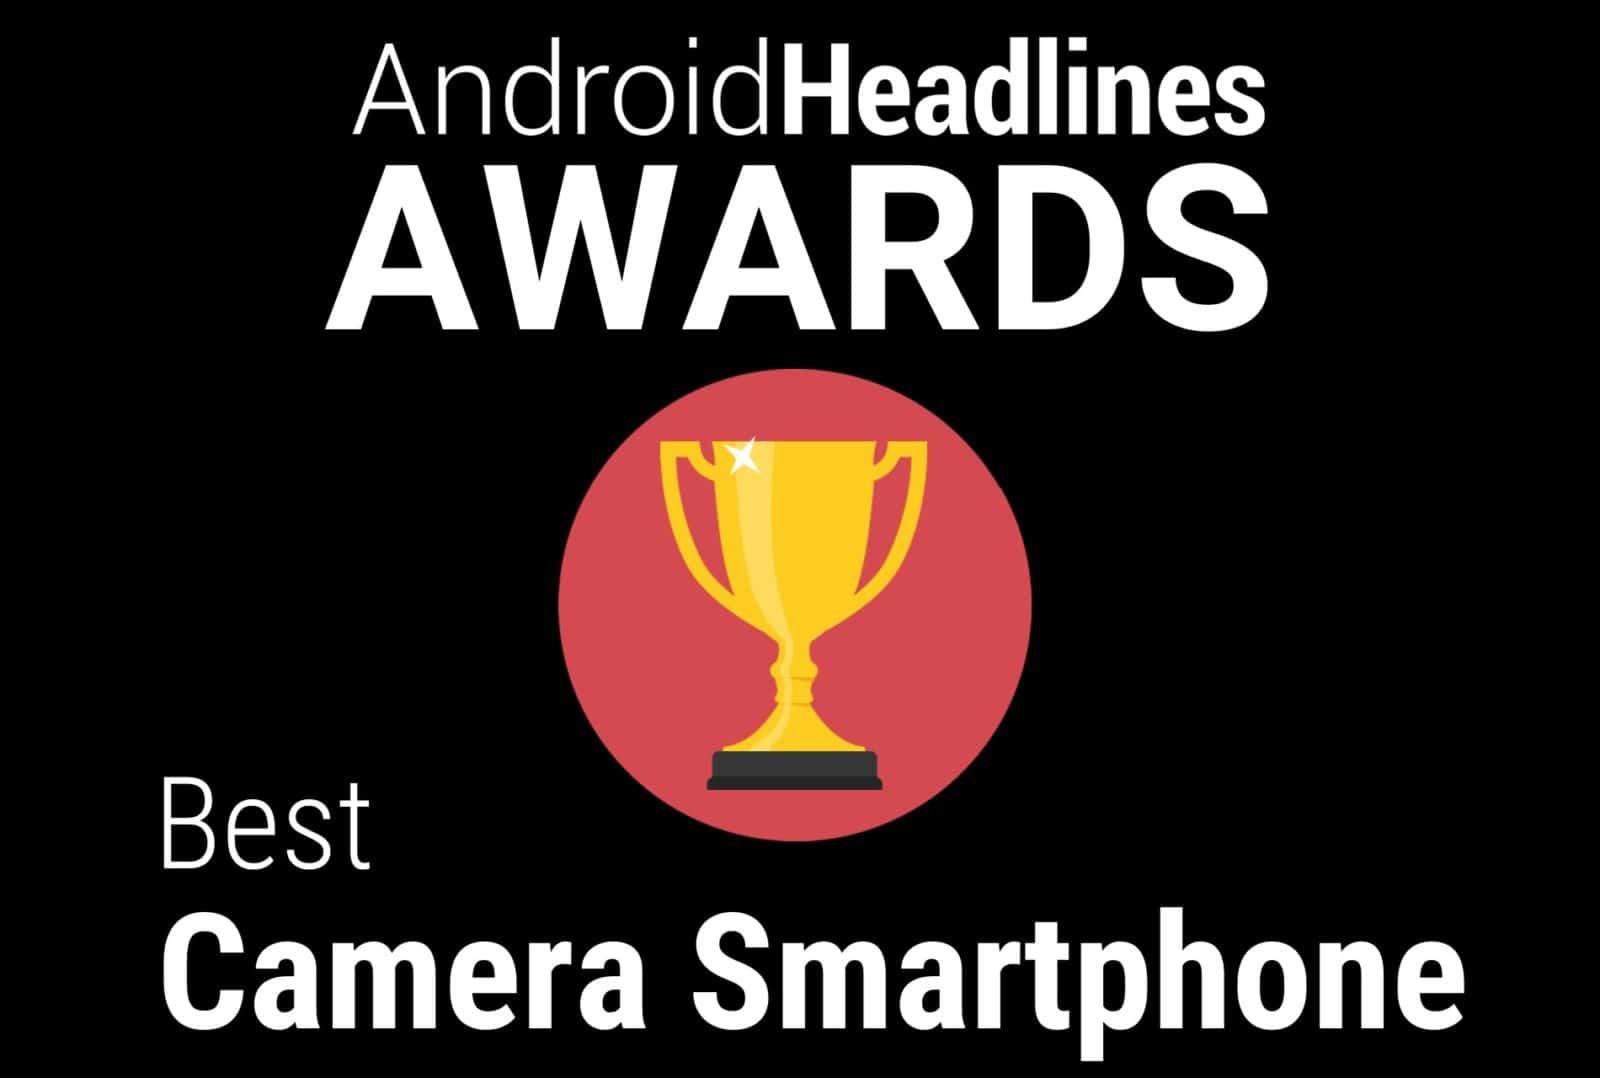 AH Awards - Best Camera Smartphone